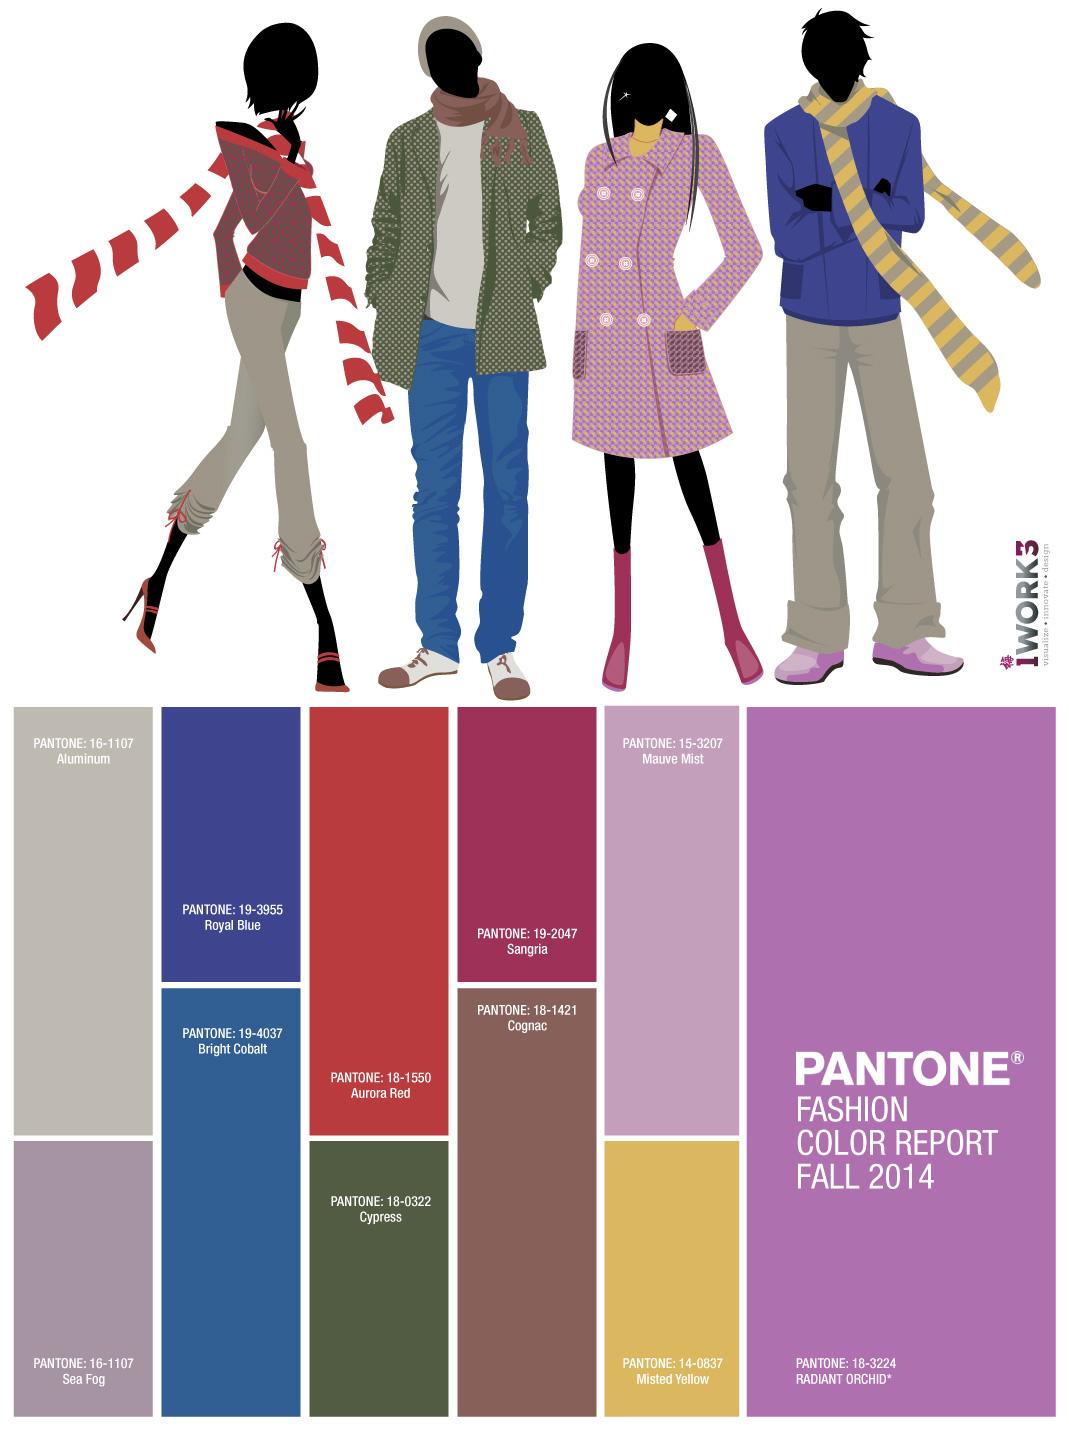 Pantone Fashion Color Report | Fall 2014/2015 | iwork3 ...